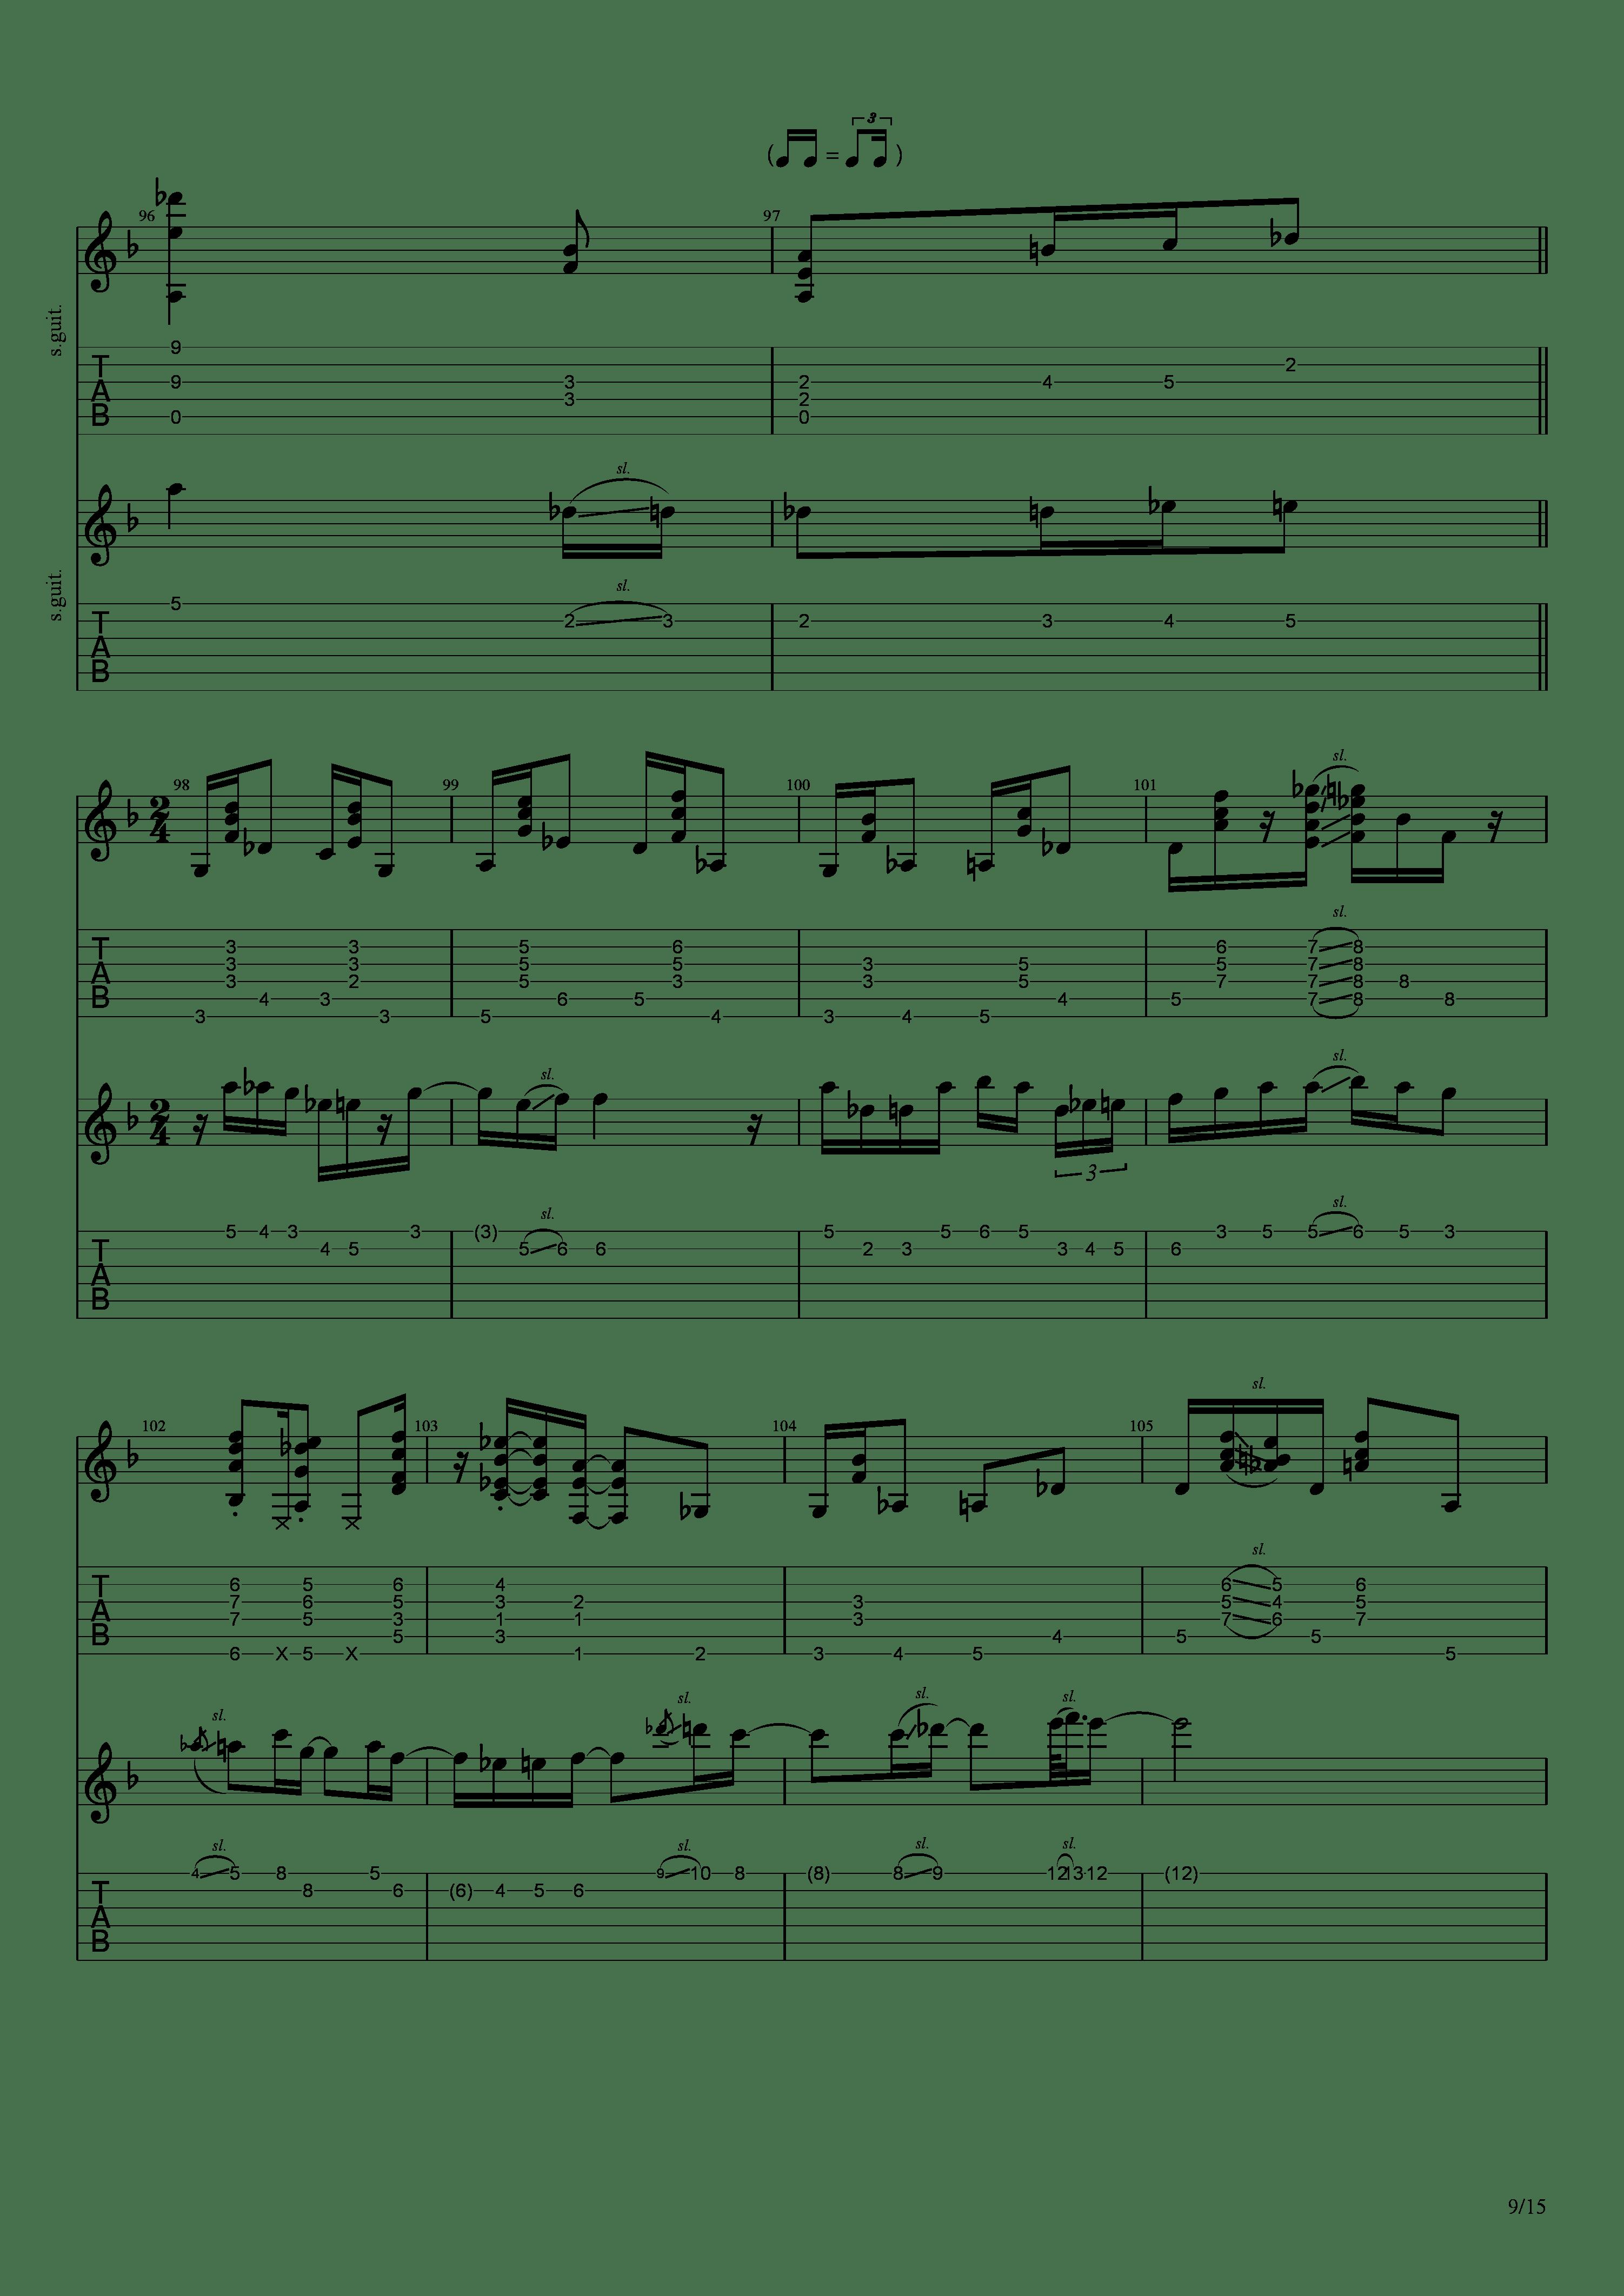 Labyrinth (松井佑贵&井草圣二)吉他谱9